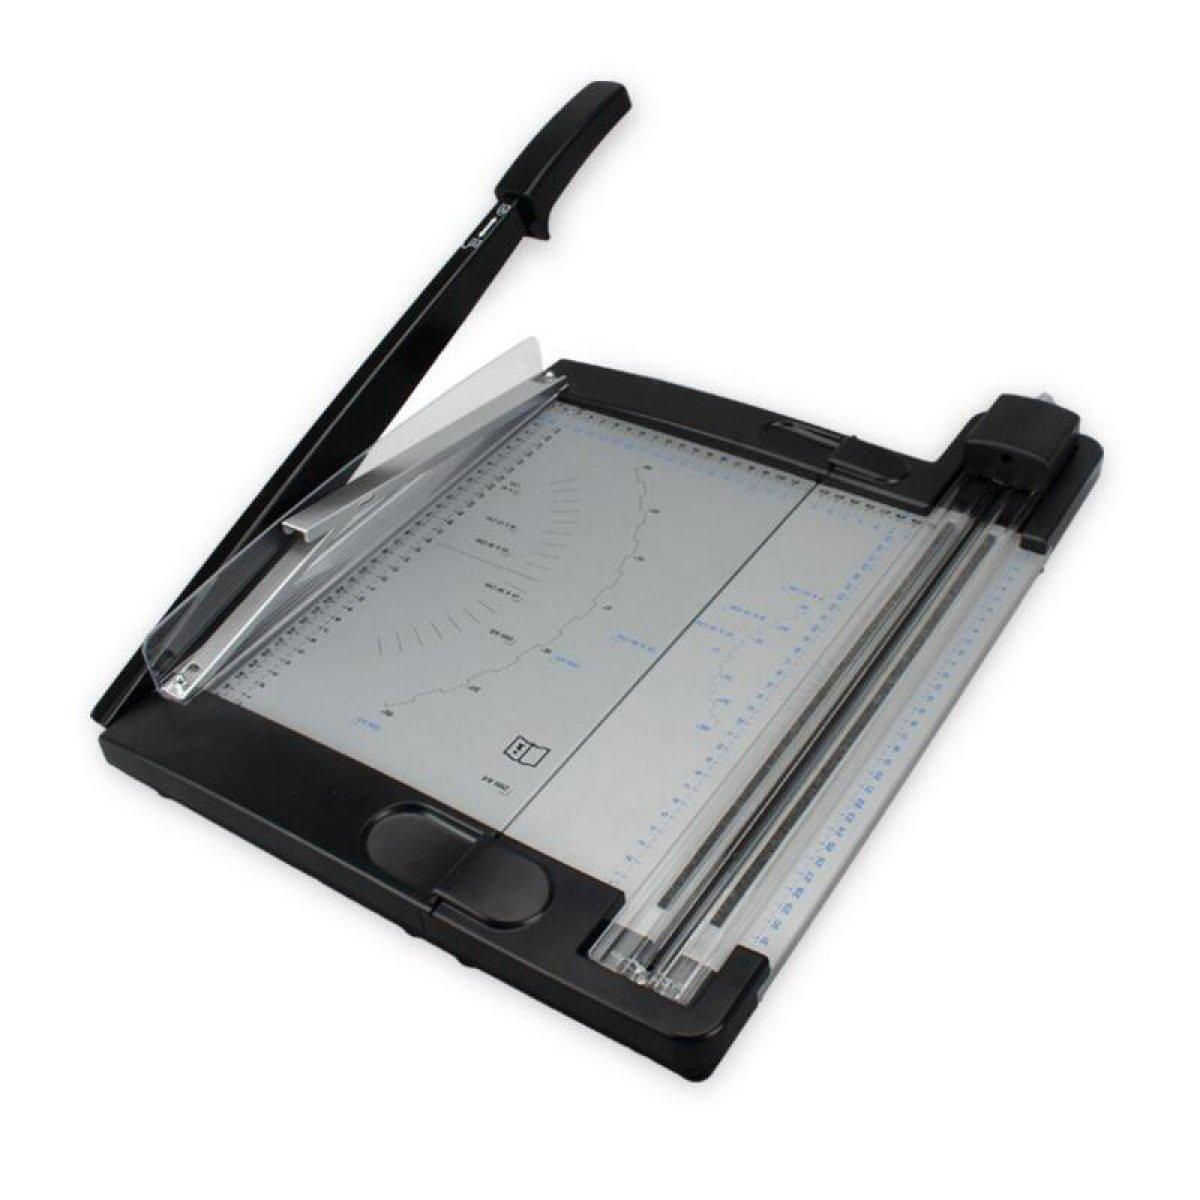 Get Quotations · Paper Cutter A4 Manual Paper Cutter Paper Cutter Photo  Cutter Craft Cutter File Cutter